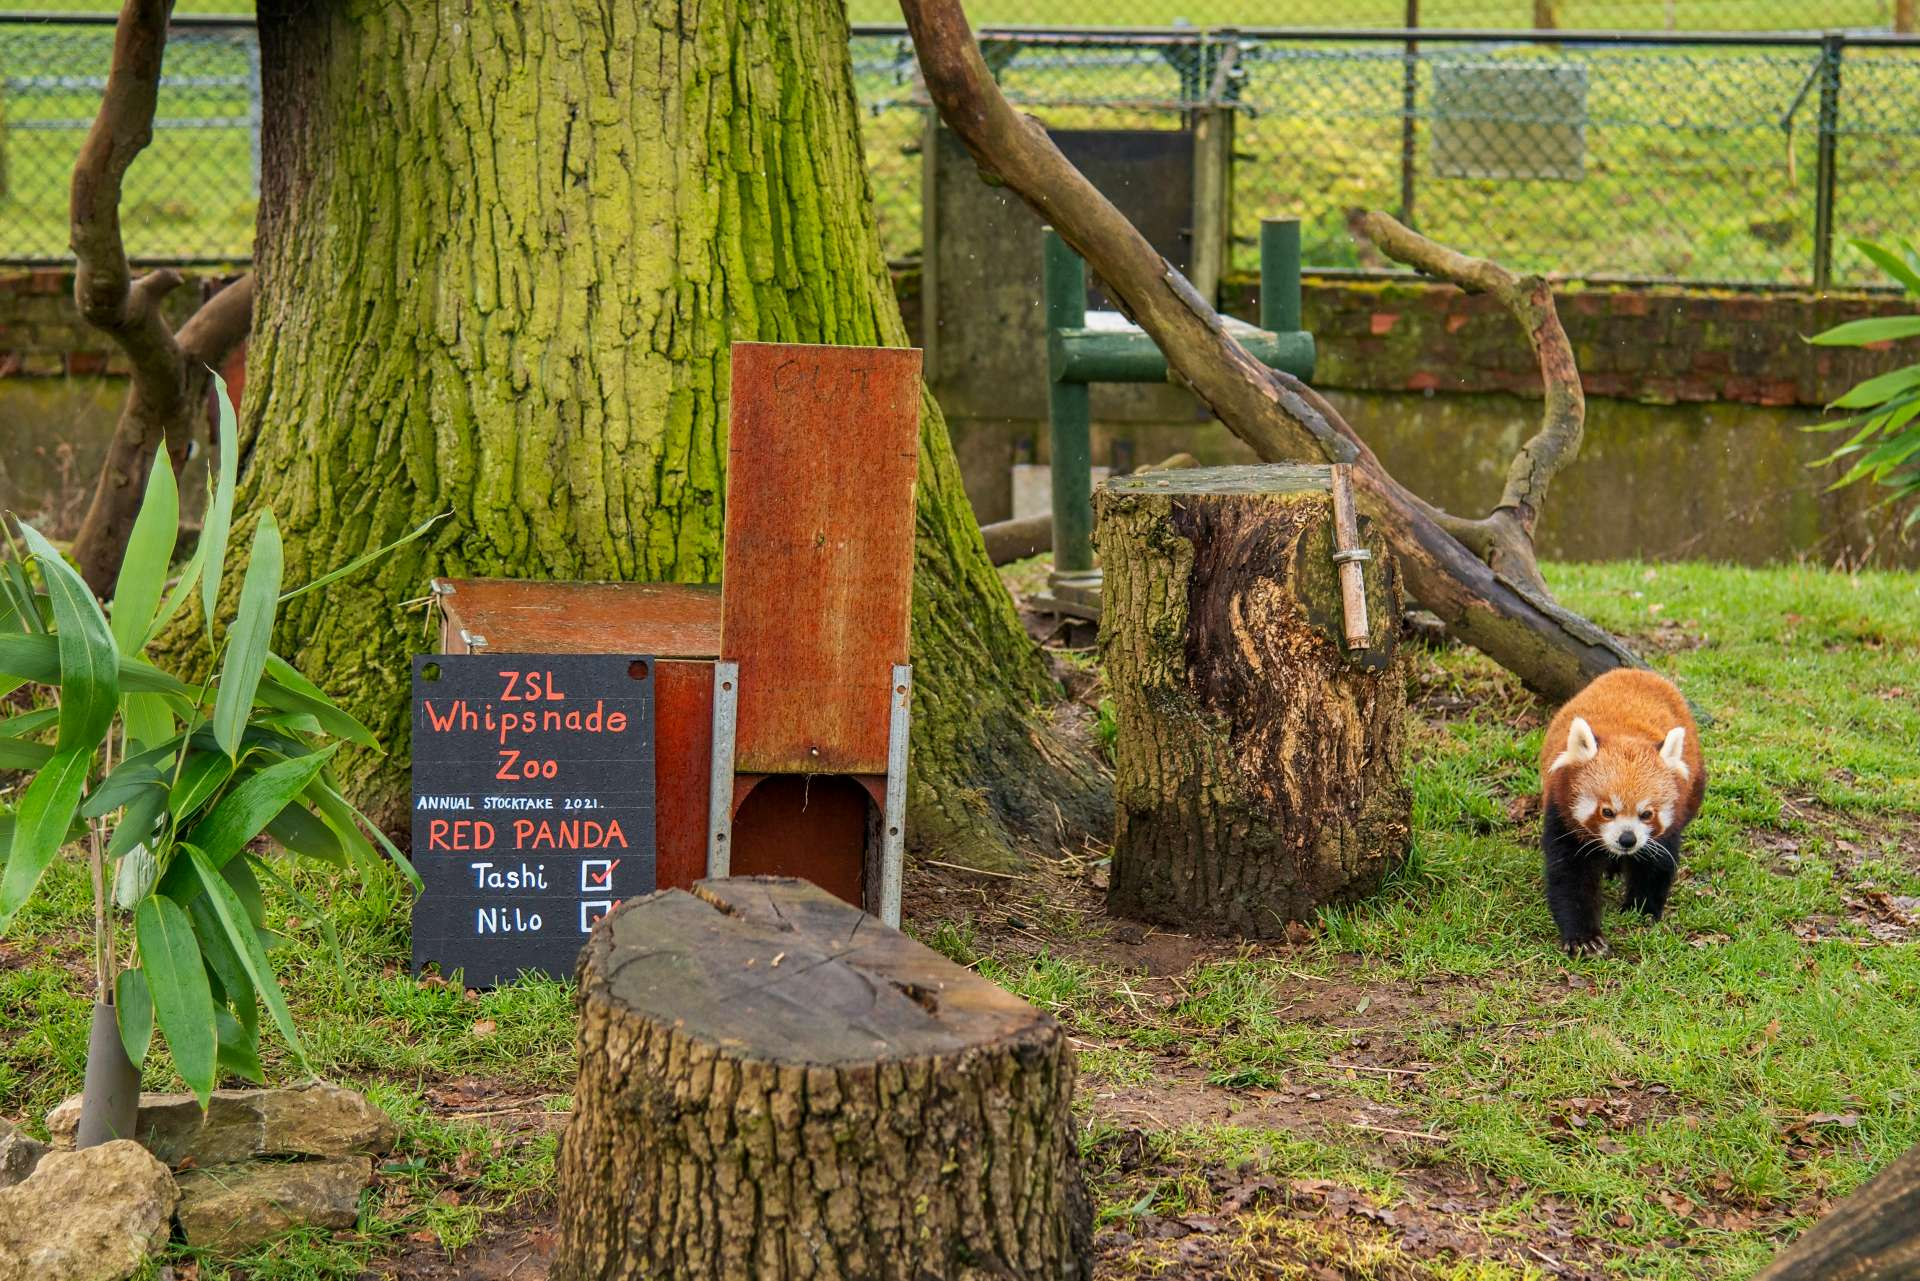 ashi Nilo Red Pandas ZSL Whipsnade Zoo - Annual Stocktake